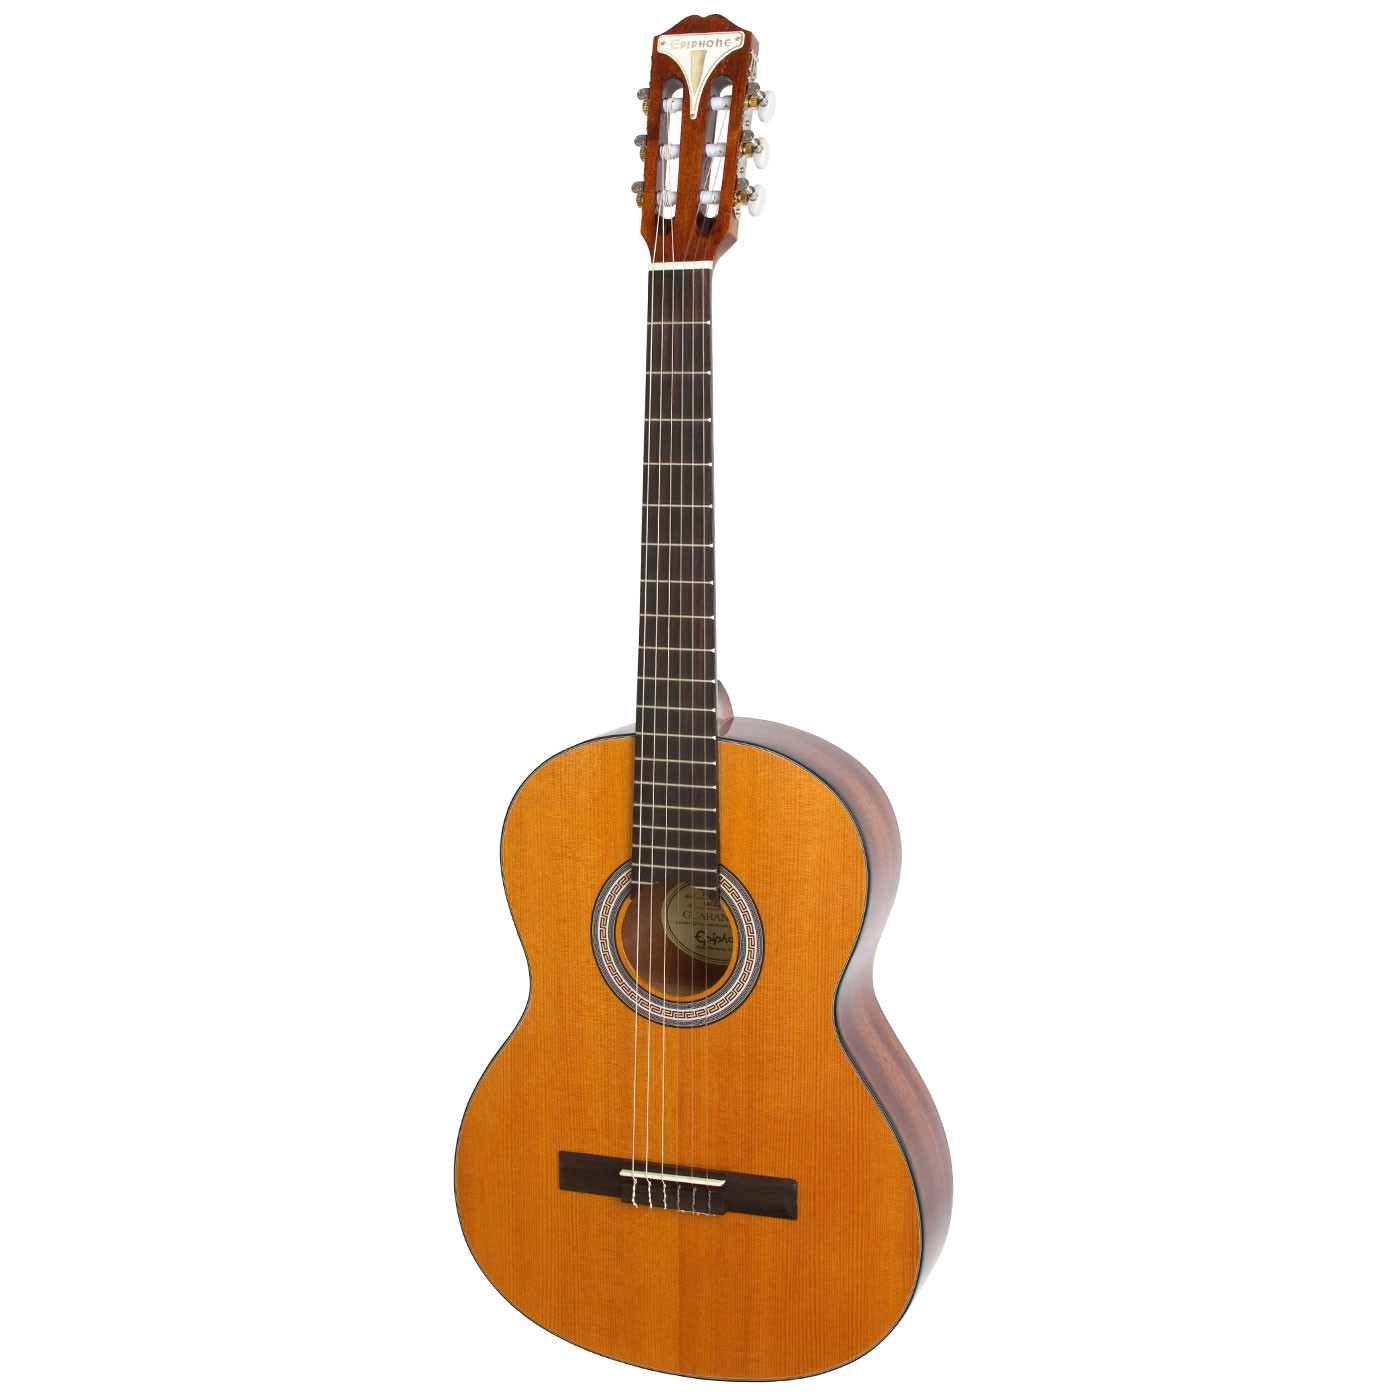 Epiphone PRO-1 Classic - Antique Natural Guitar